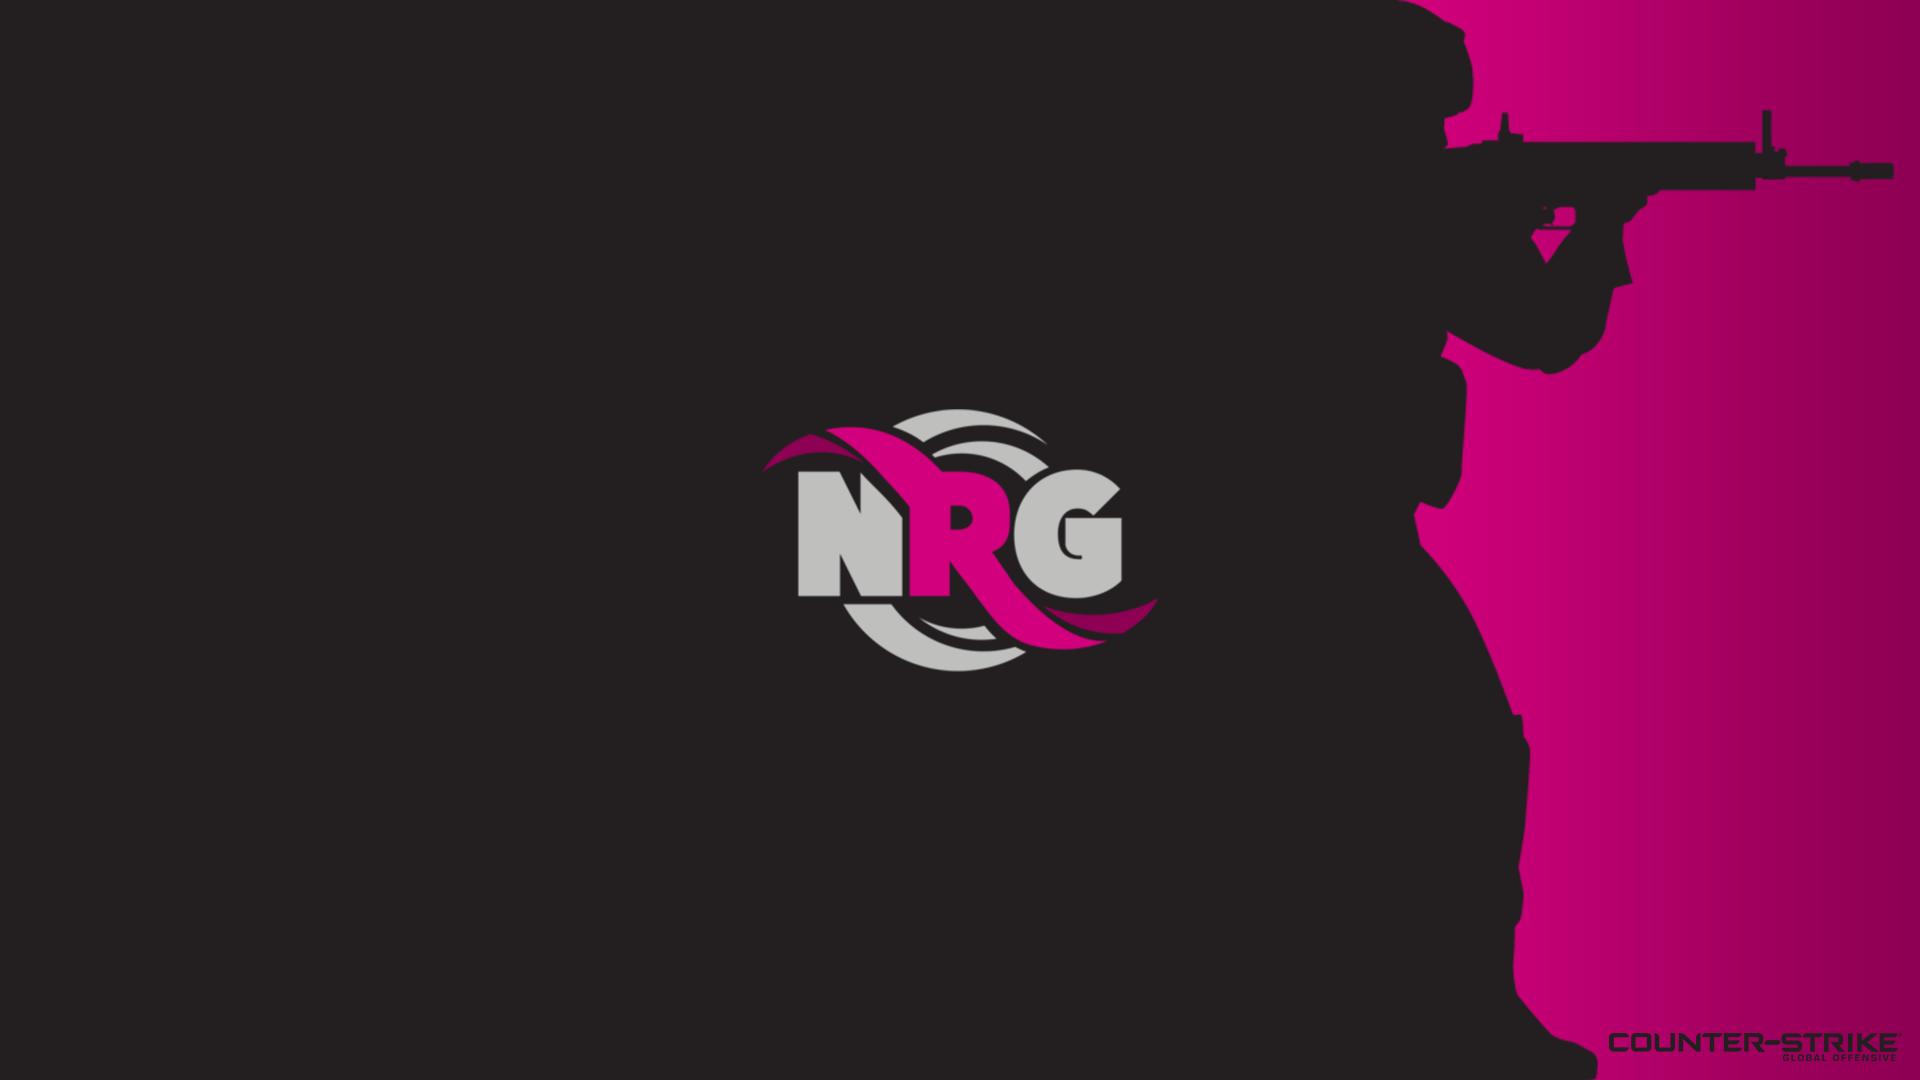 Black with logo - NRG